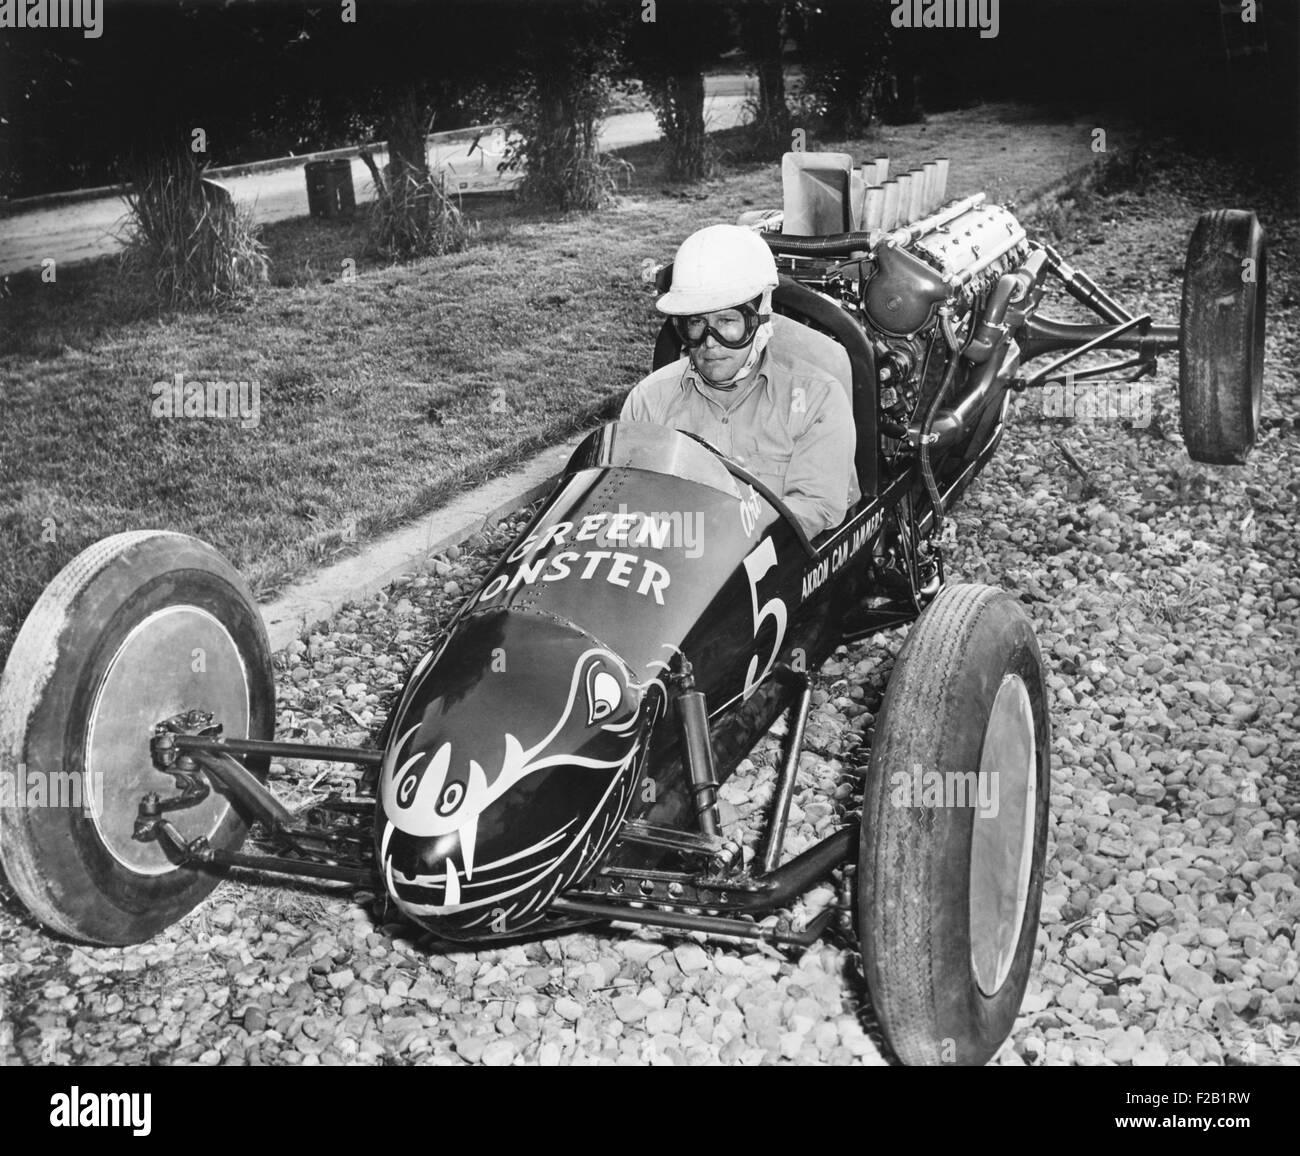 Walter Arfons' 'Green Monster #5' a homemade hot rod, with a 1000 horsepower Ranger aircraft engine. It was - Stock Image